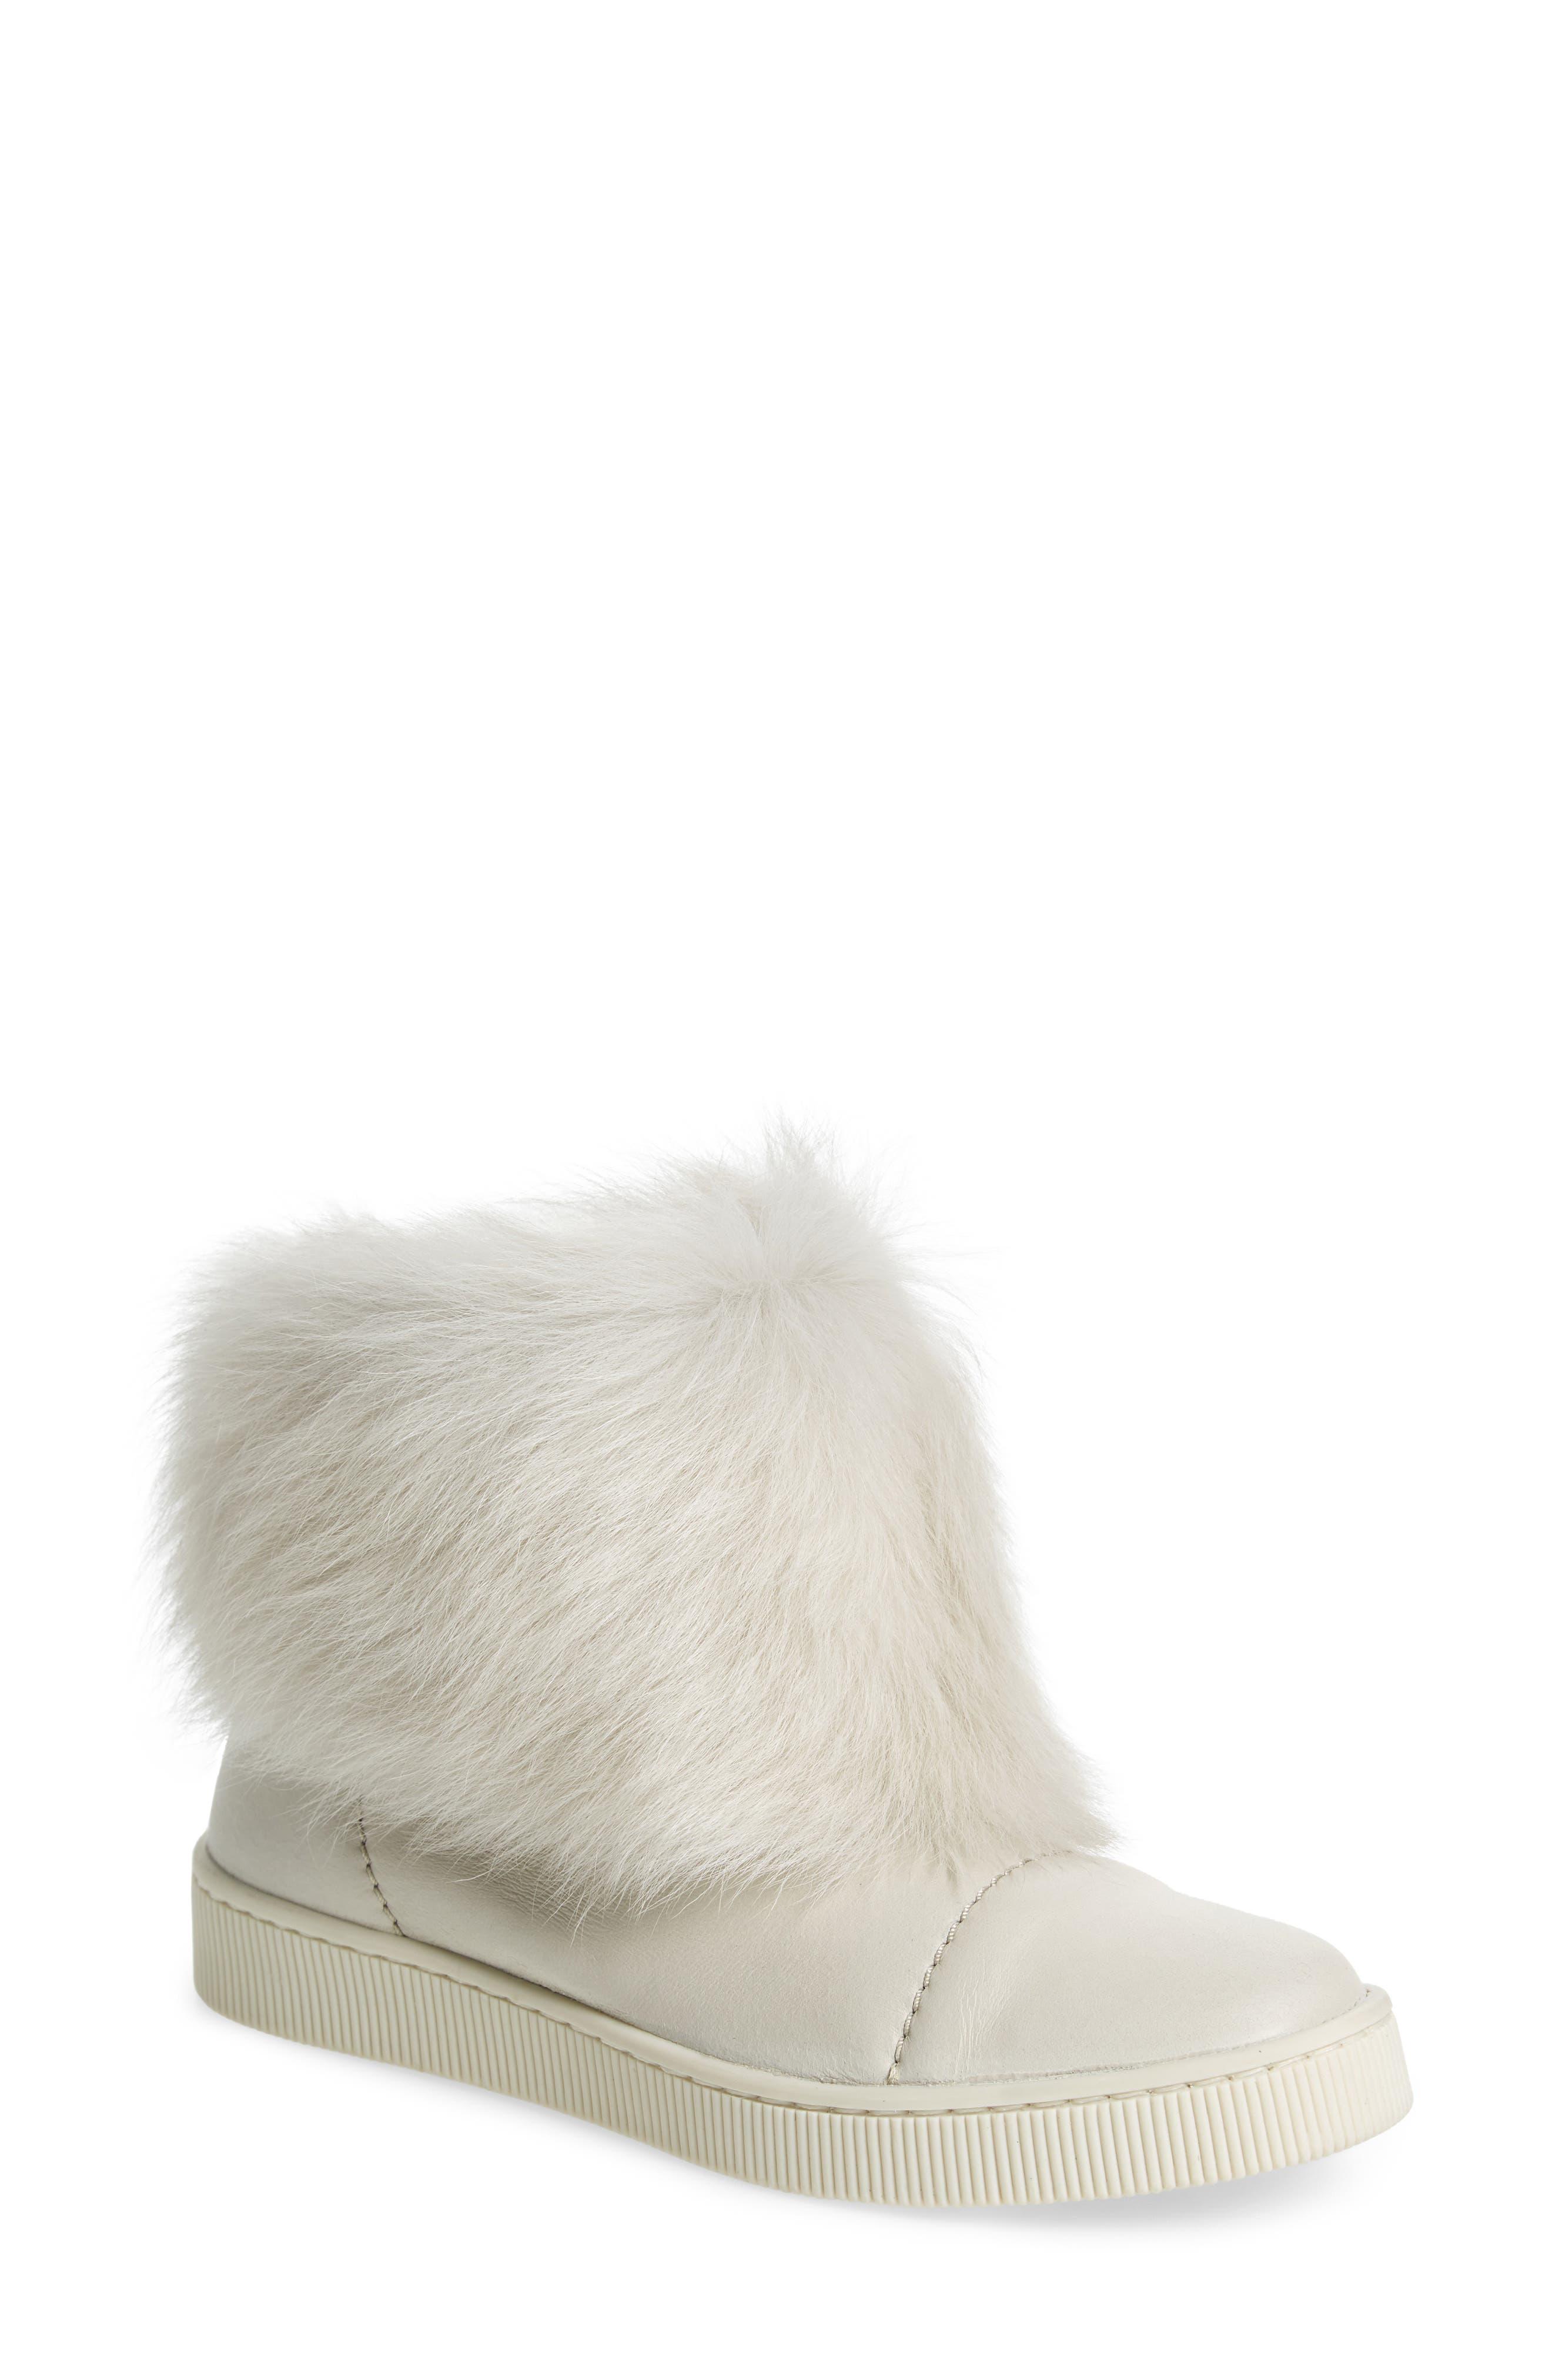 Alternate Image 1 Selected - Pedro Garcia Priya Genuine Shearling Sneaker Boot (Women)